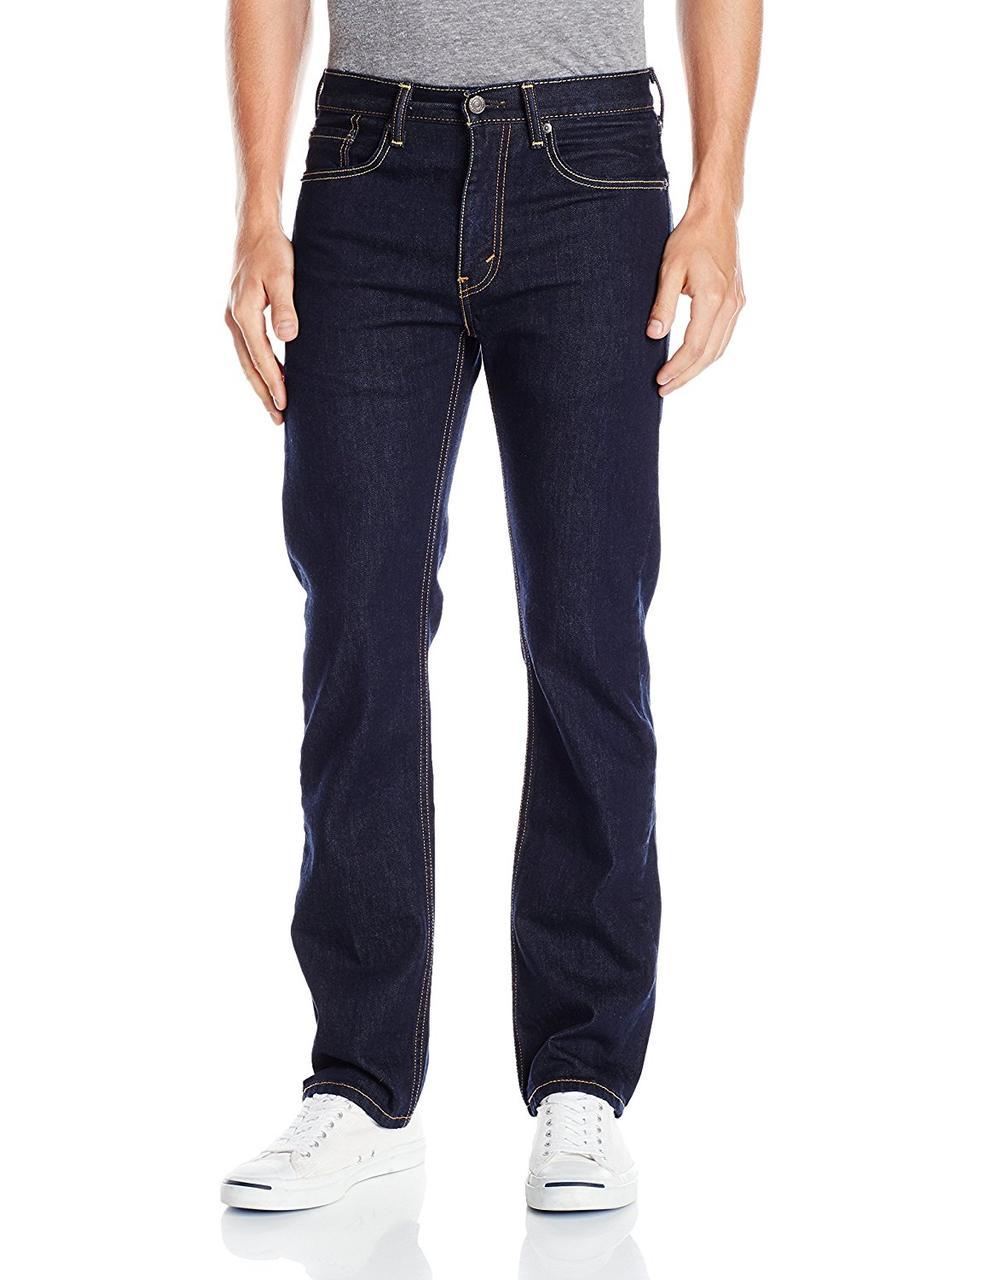 Джинсы Levi's 505 Regular Fit, Stowe-Stretch, 30W30L, 005051518